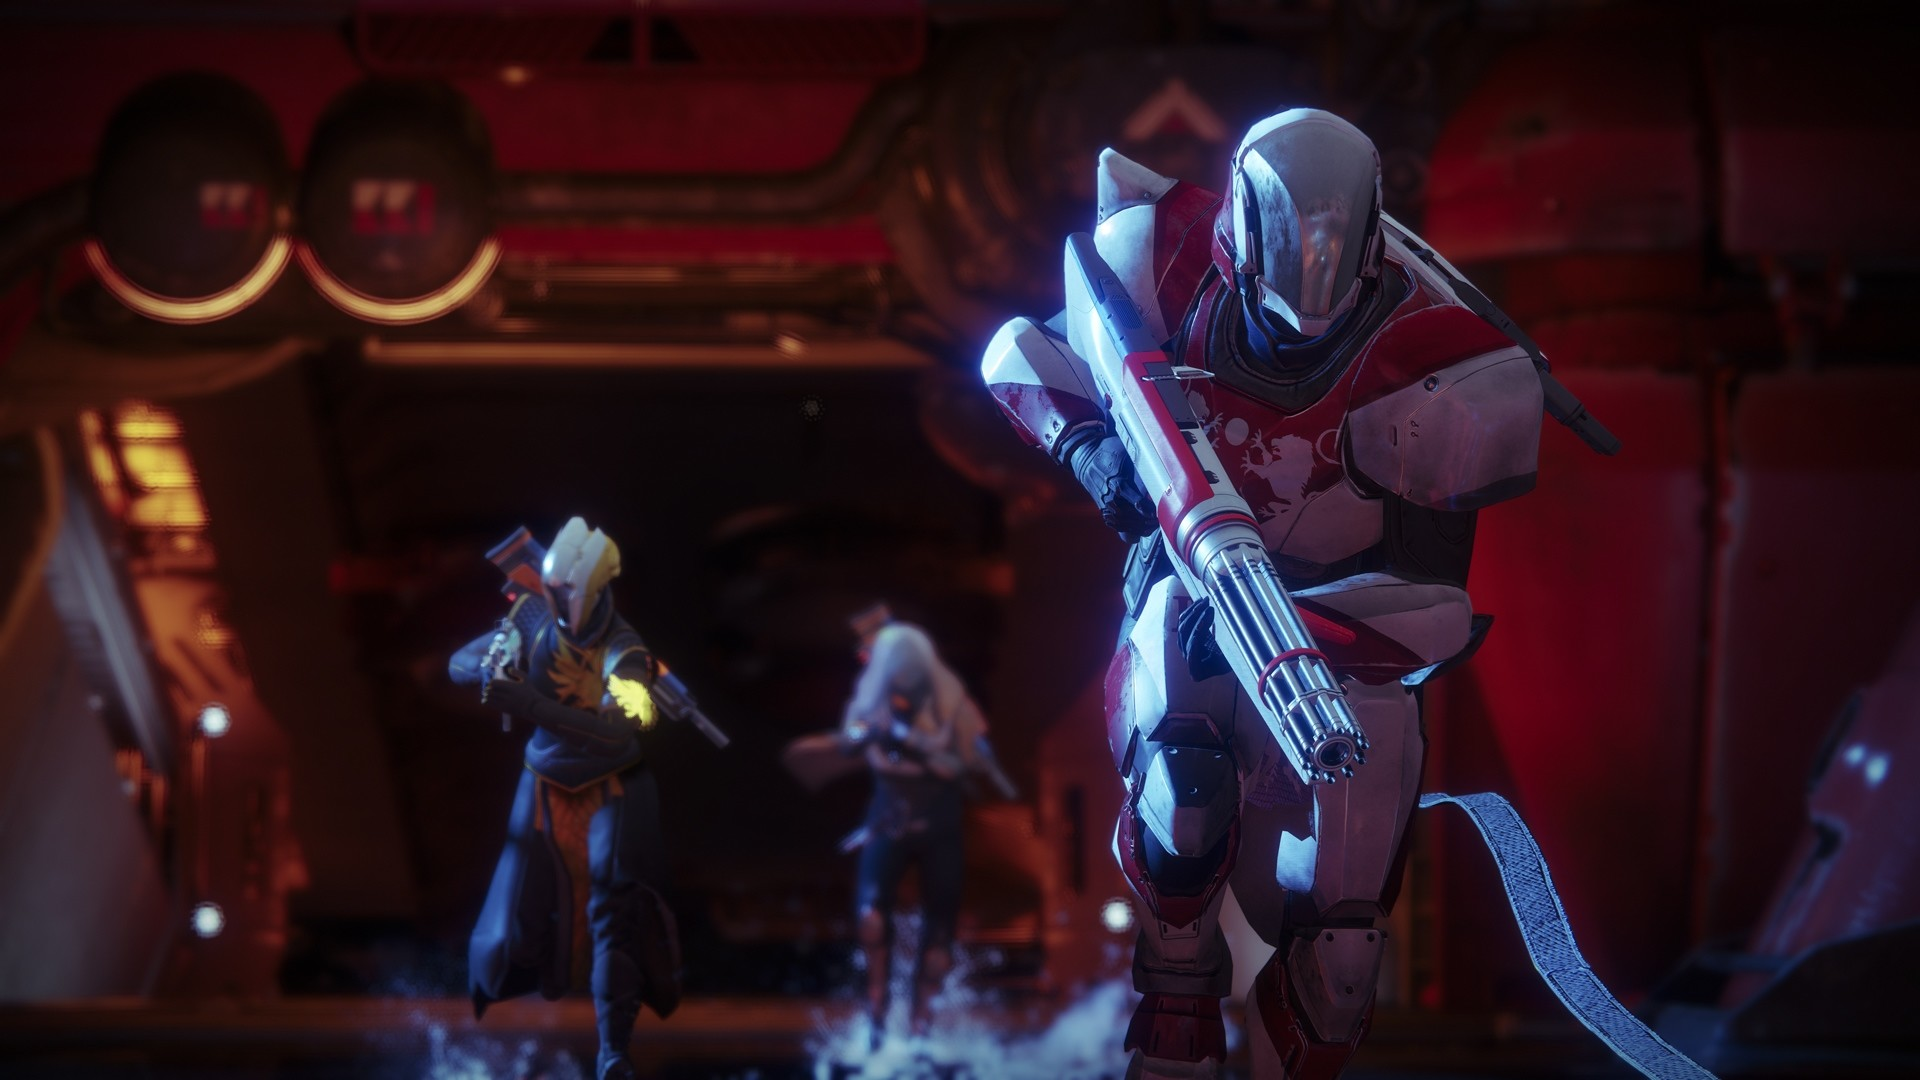 Cool Destiny 2 Guardians Titan Warlock and Hunter wallpaper